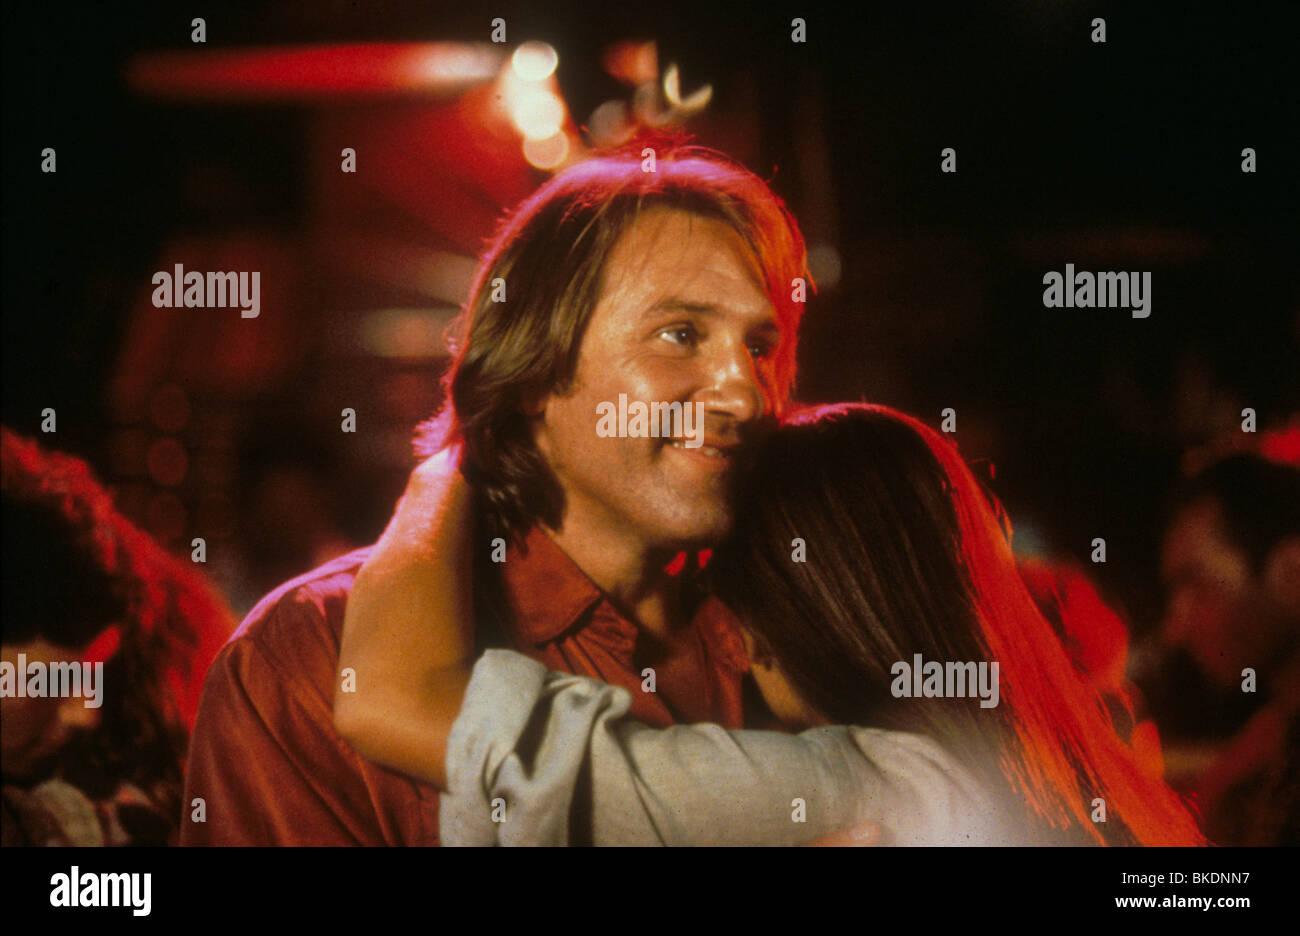 MON PERE CE HEROS (1994) MY FATHER THE HERO (ALT) GERARD DEPARDIEU, MARIE GILLAIN MPCH 003 - Stock Image